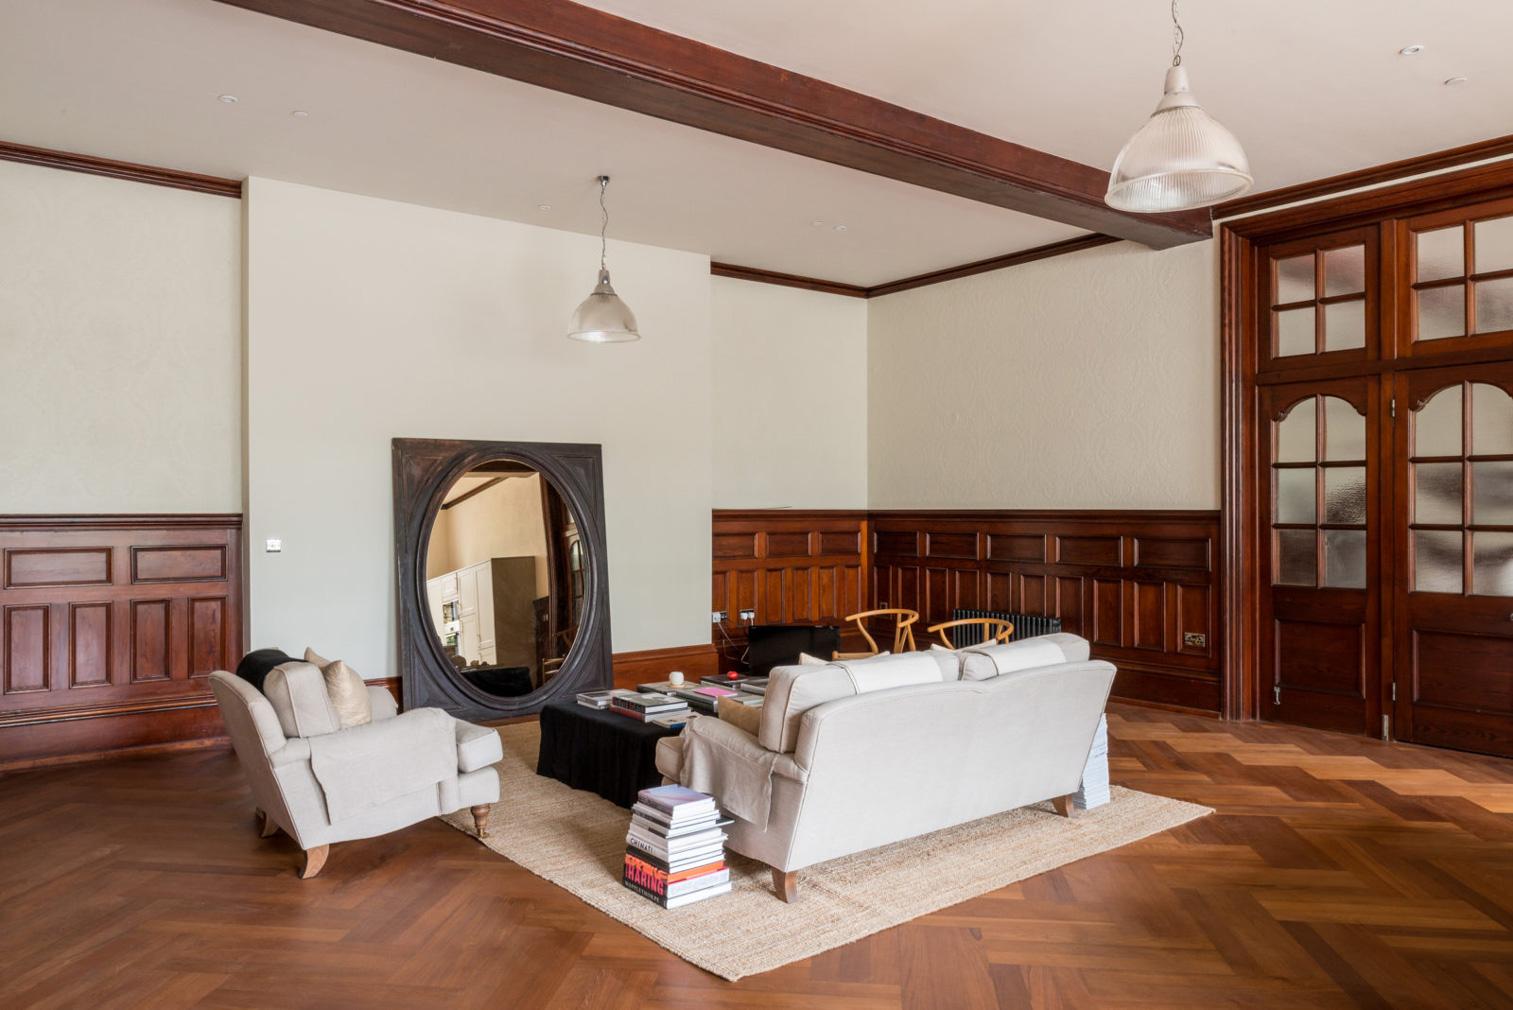 Elegant ballroom apartment hits the market in the UK's St Leonards-on-Sea